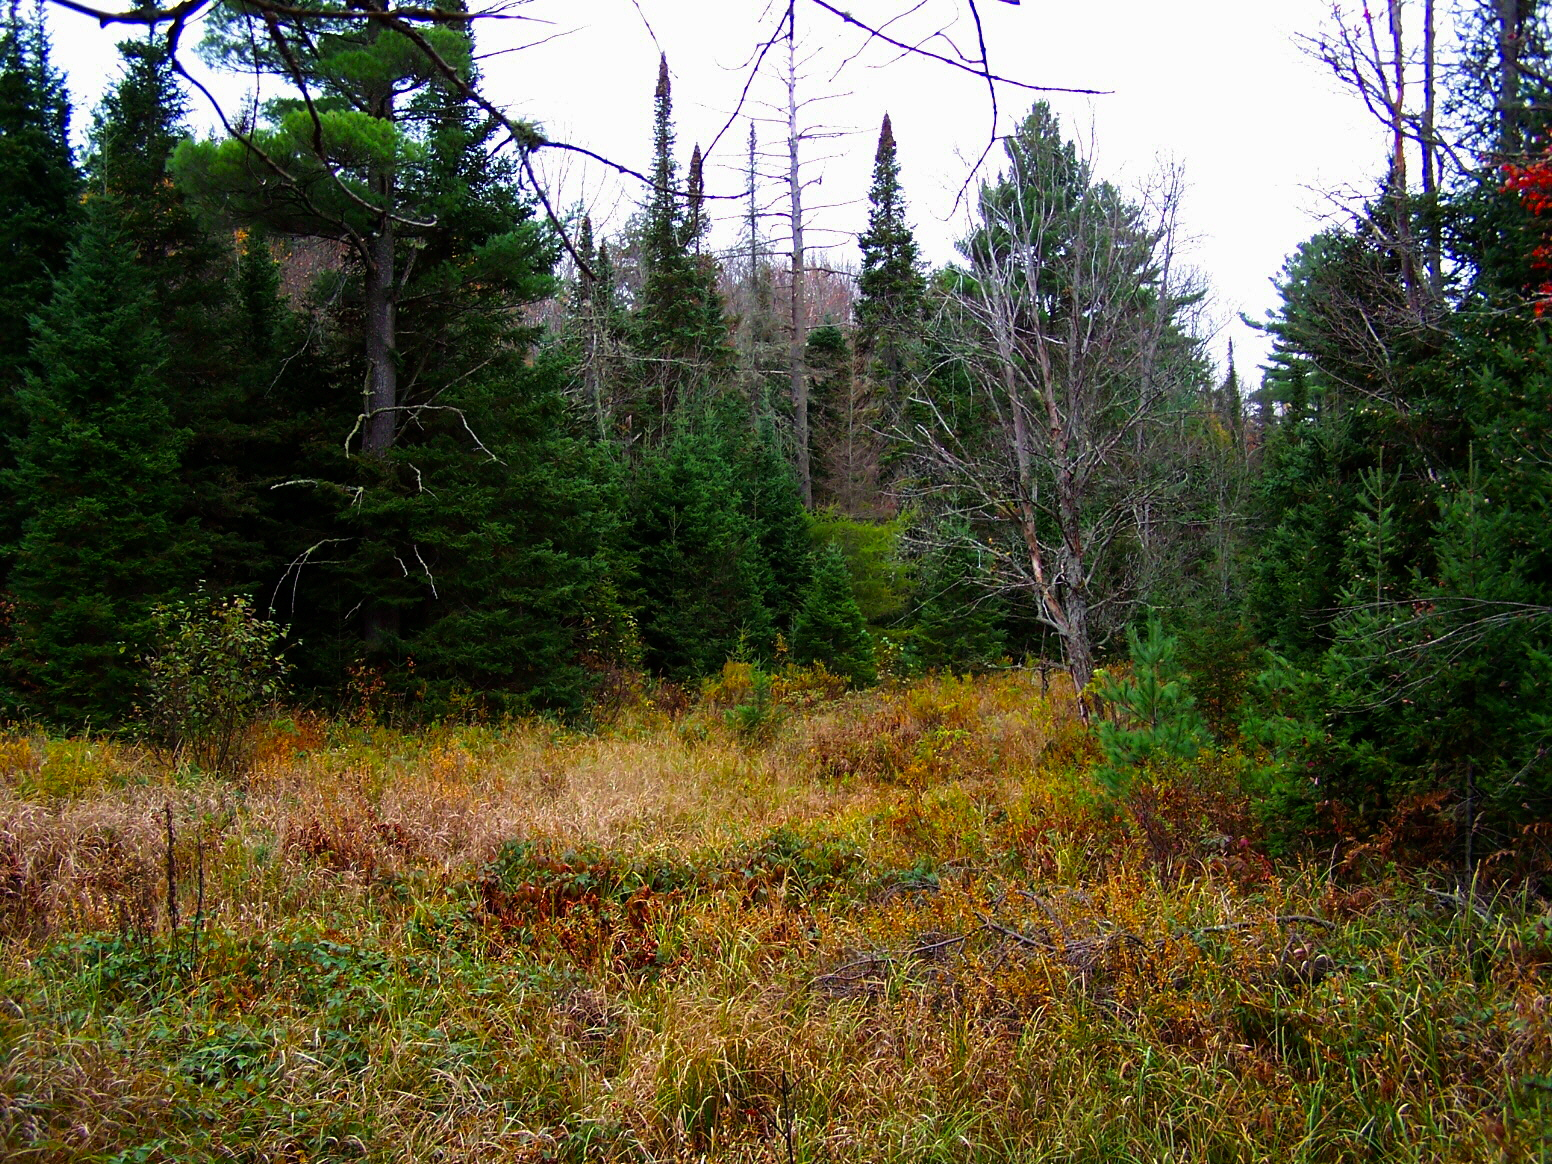 moose licence application newfoundland 2015